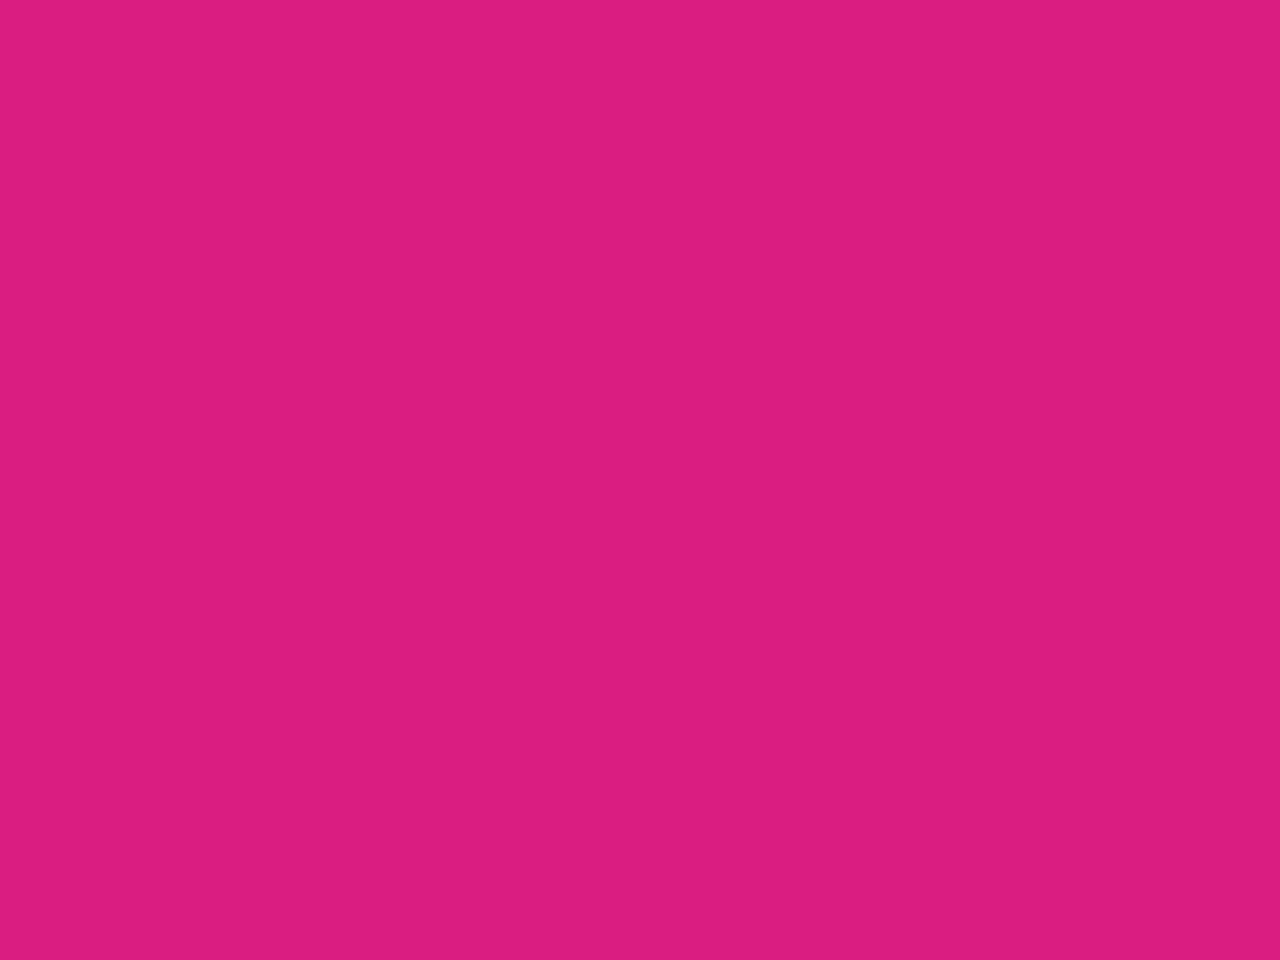 1280x960 Vivid Cerise Solid Color Background